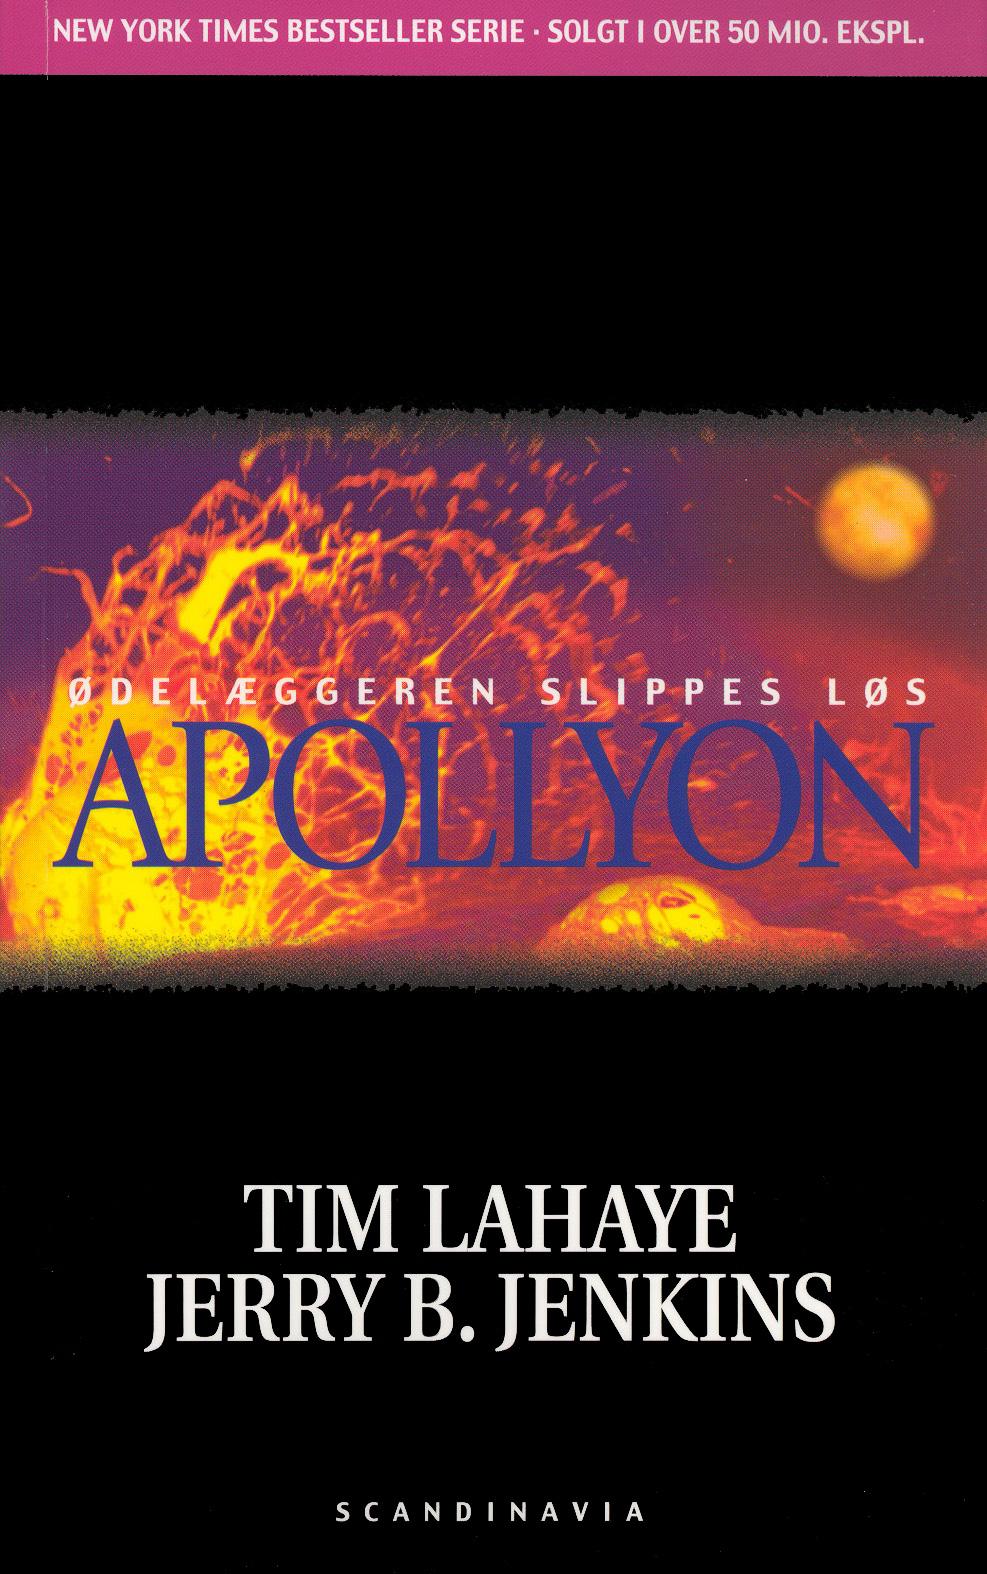 N/A Apollyon - e-bog på bog & mystik